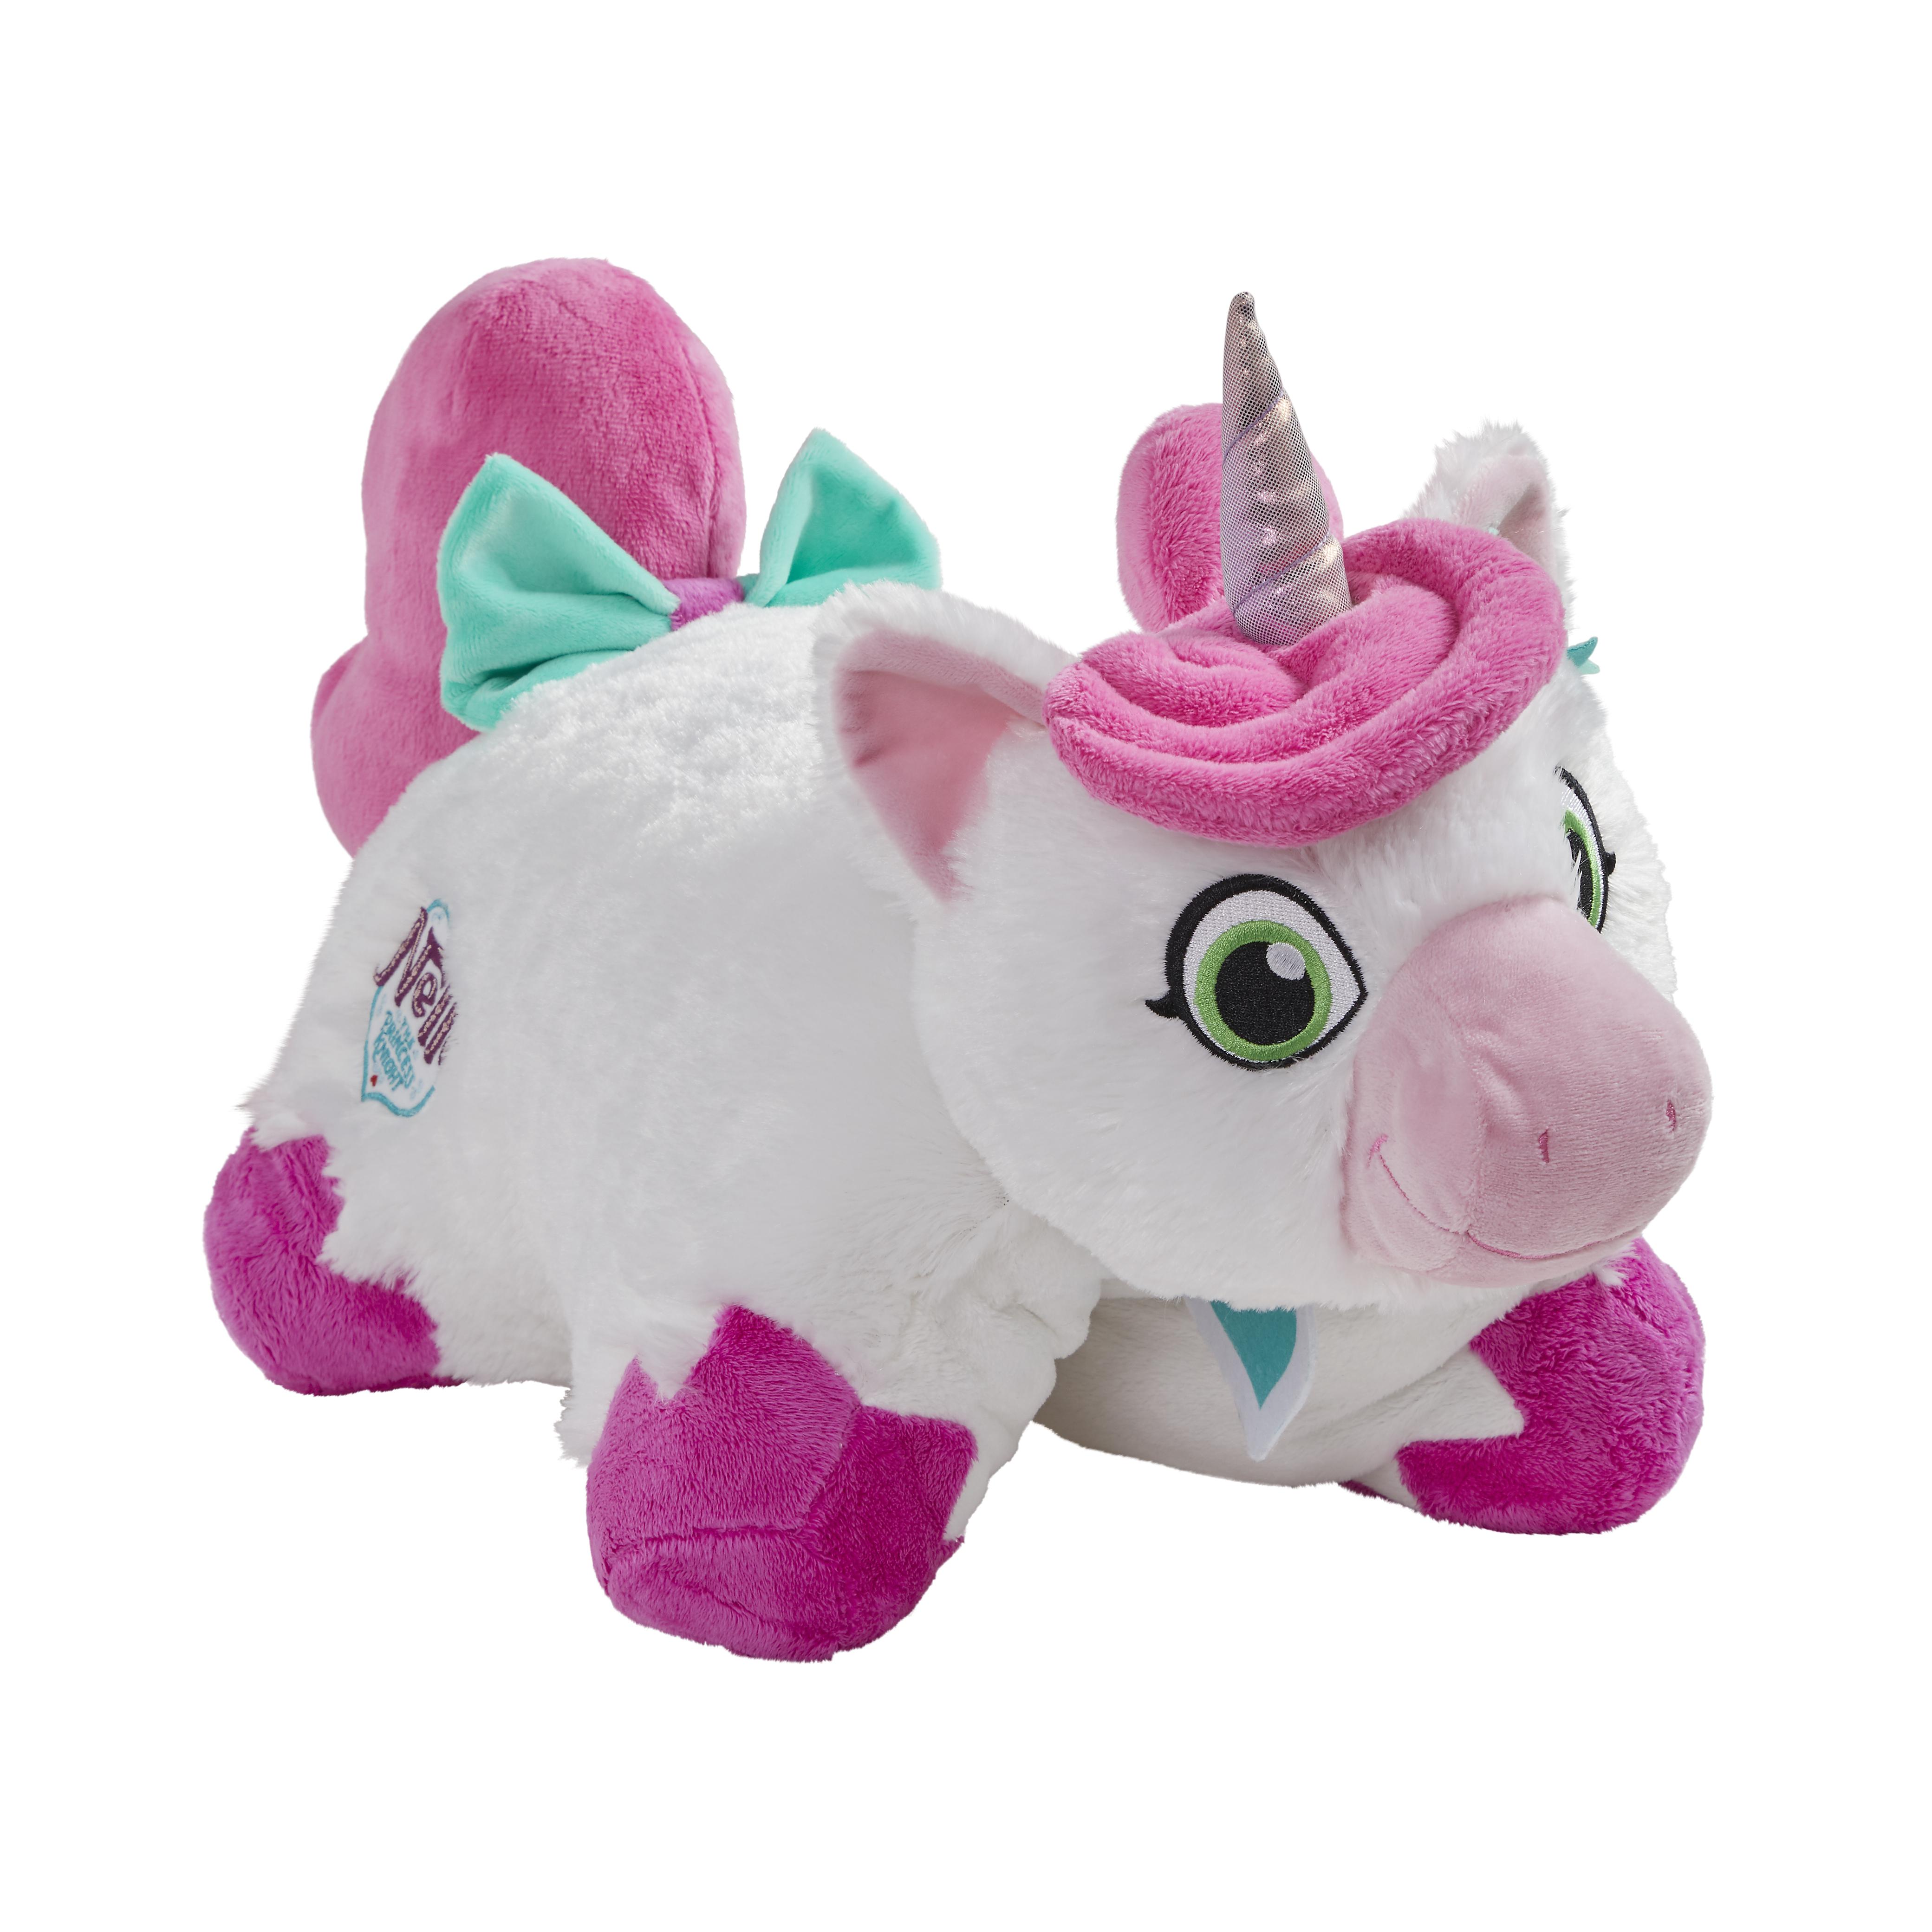 "Pillow Pets 16"" Nickelodeon Nella The Princess Knight Stuffed Animal Plush Toy Pillow Pet- Trinket"